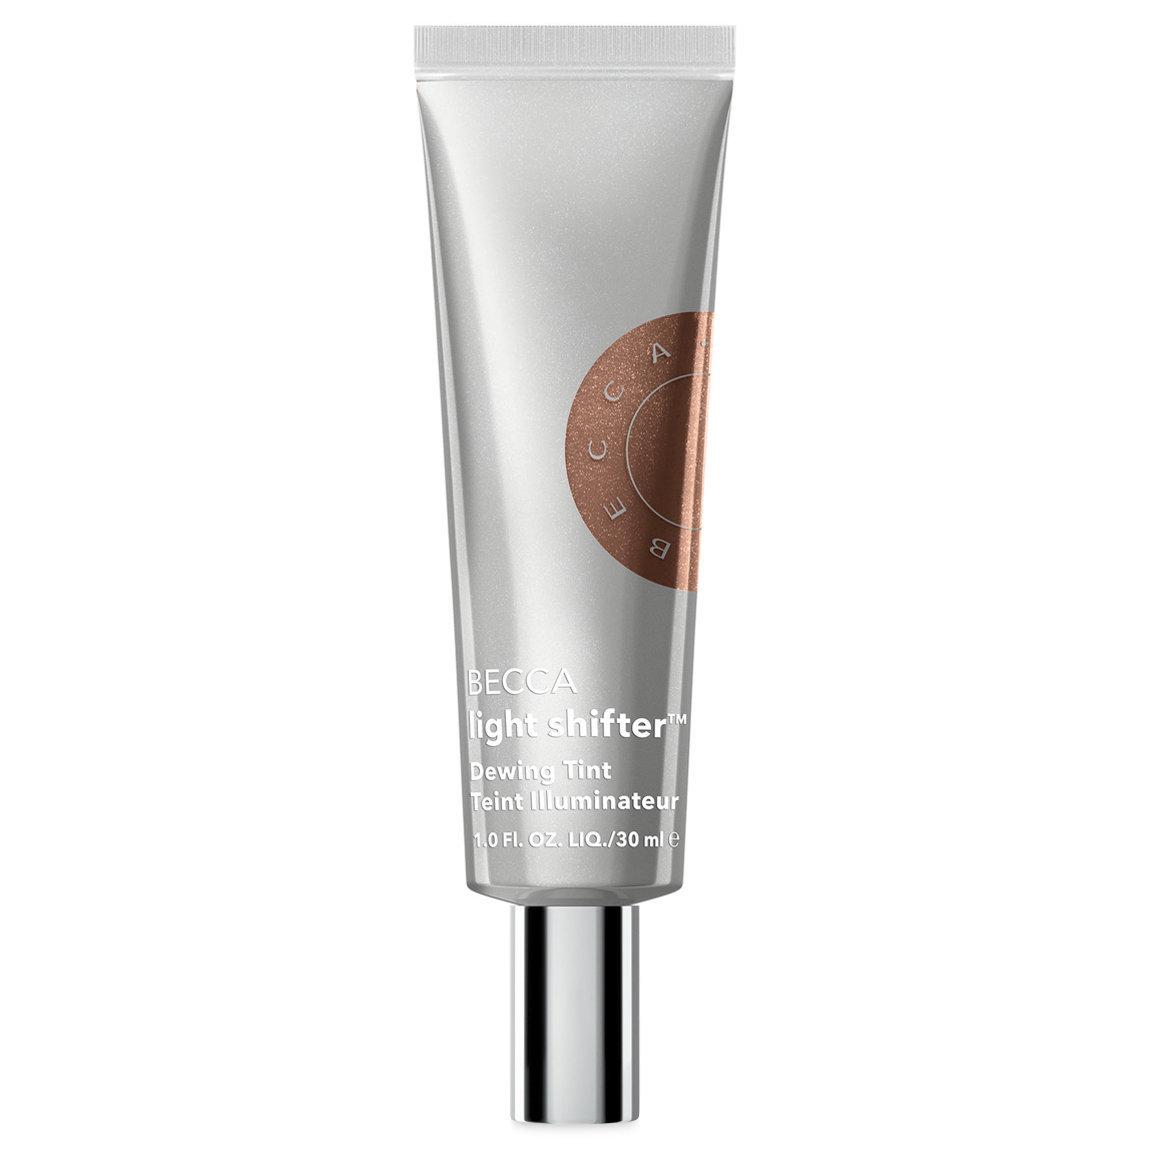 BECCA Cosmetics Light Shifter Dewing Tint Luna 6.5 alternative view 1.